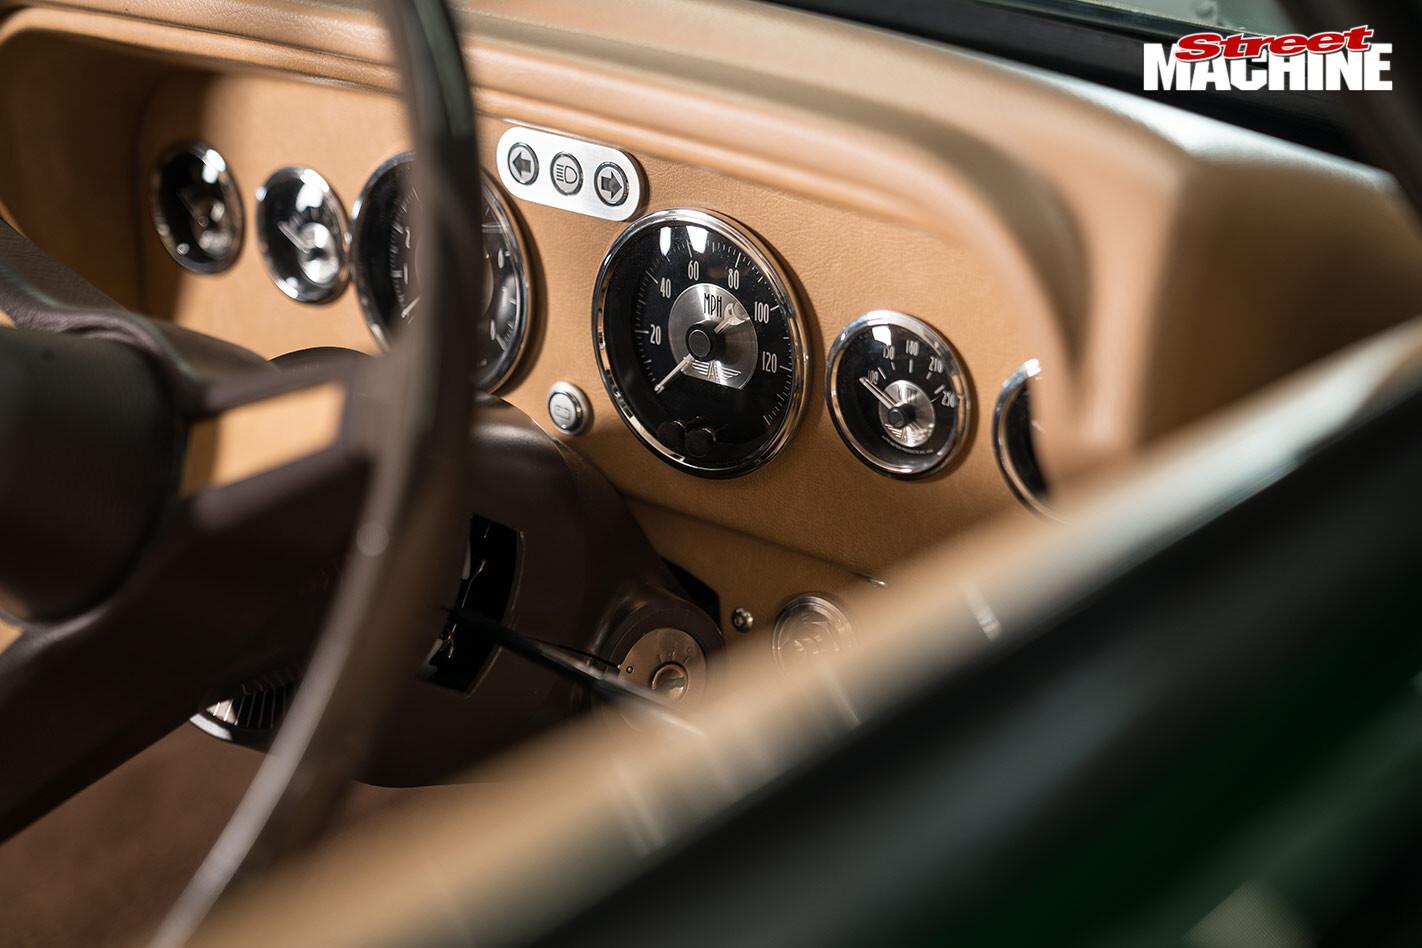 Chrysler Centura dash